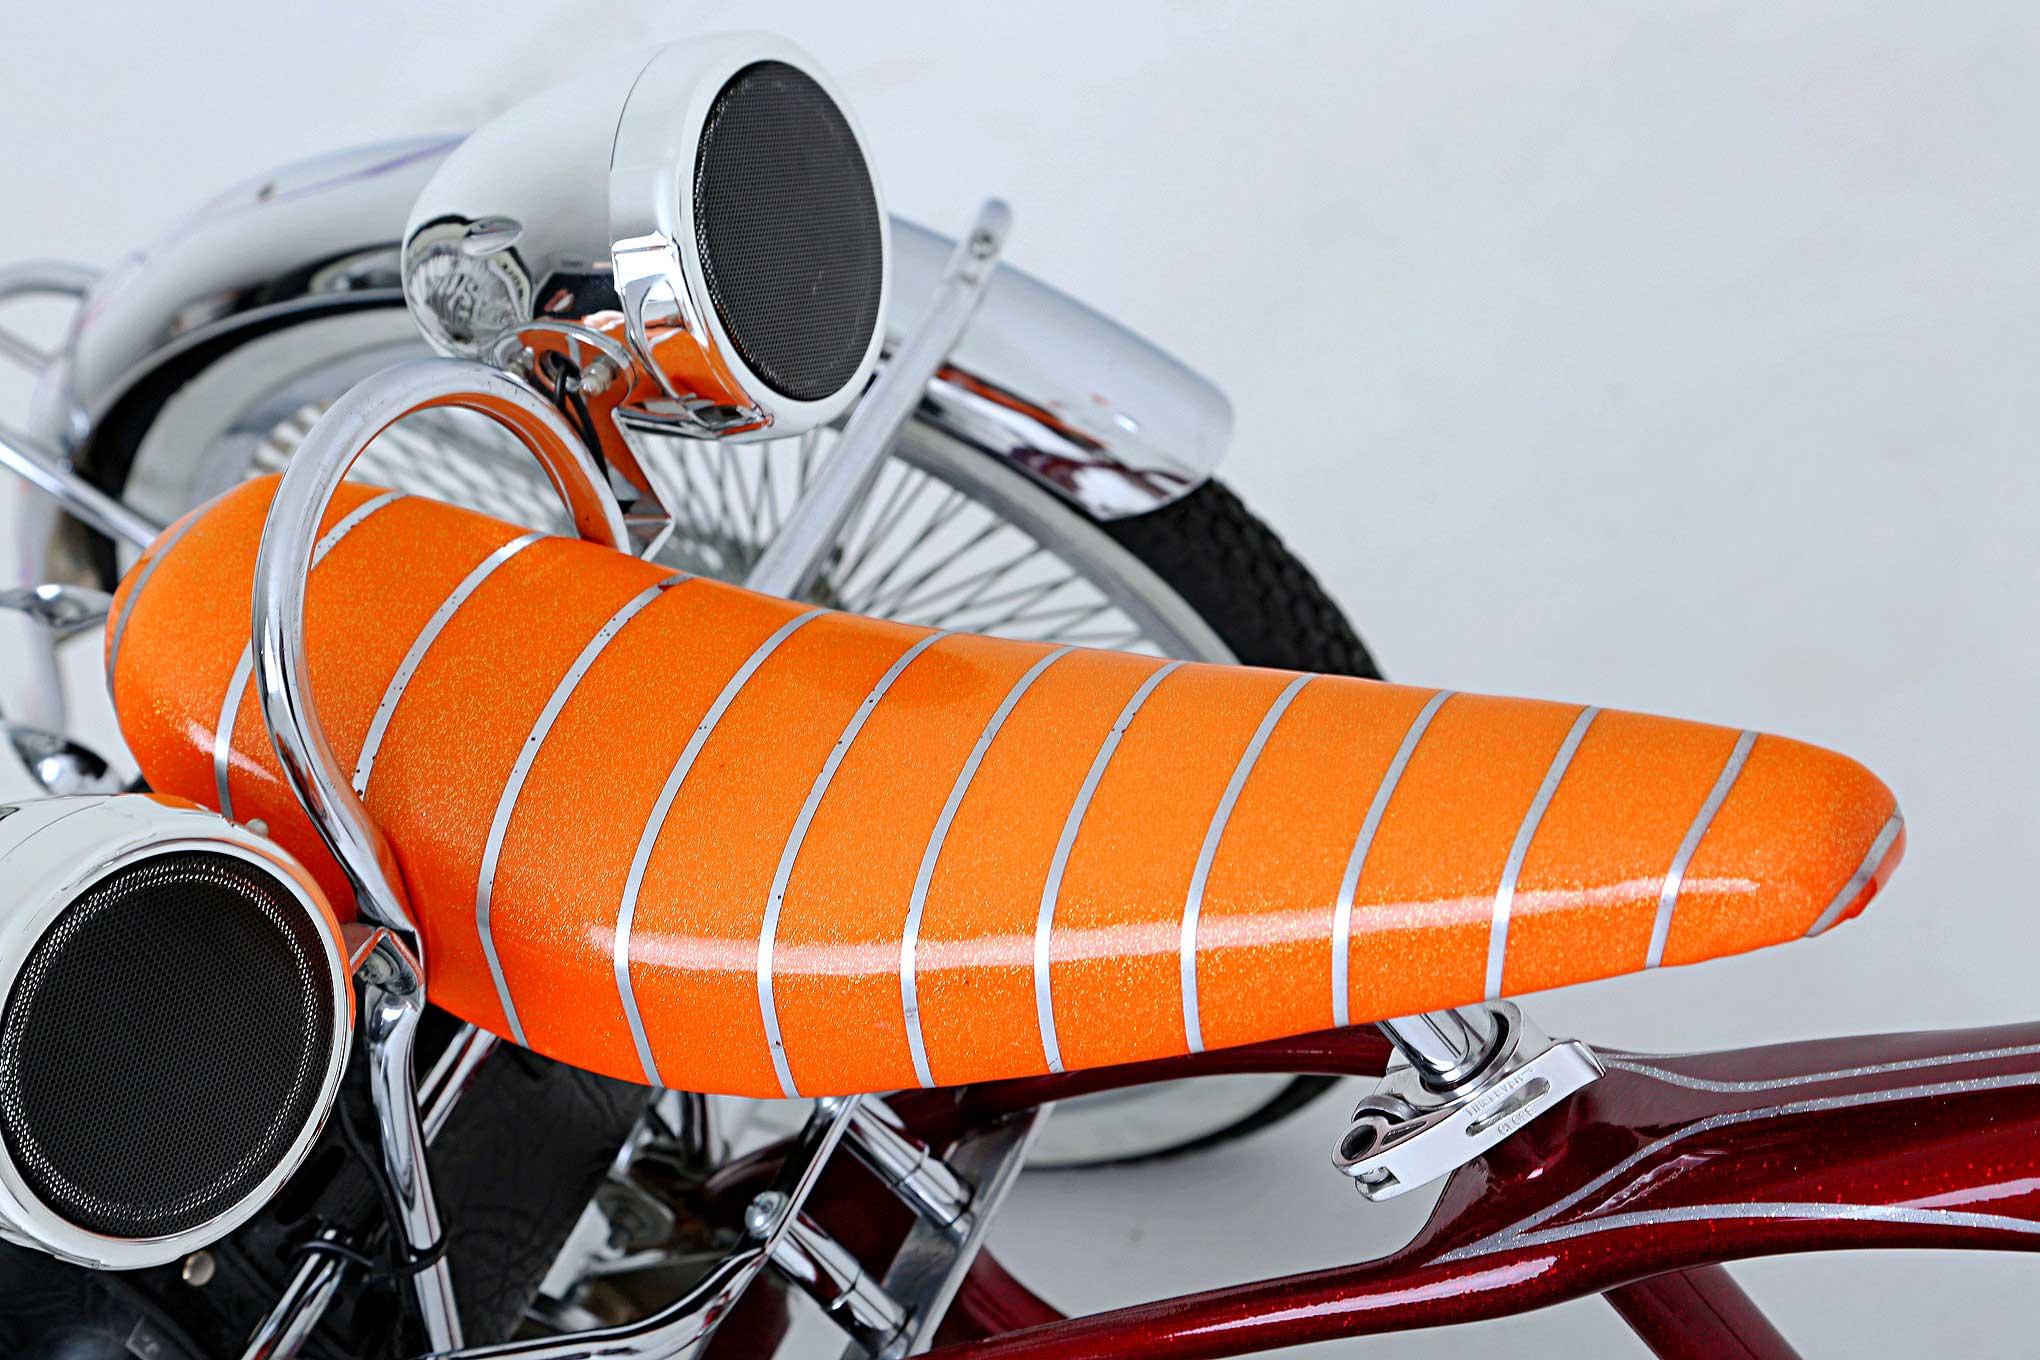 Lowrider Rims And Tires >> 1969 Schwinn Trike - A New Appreciation